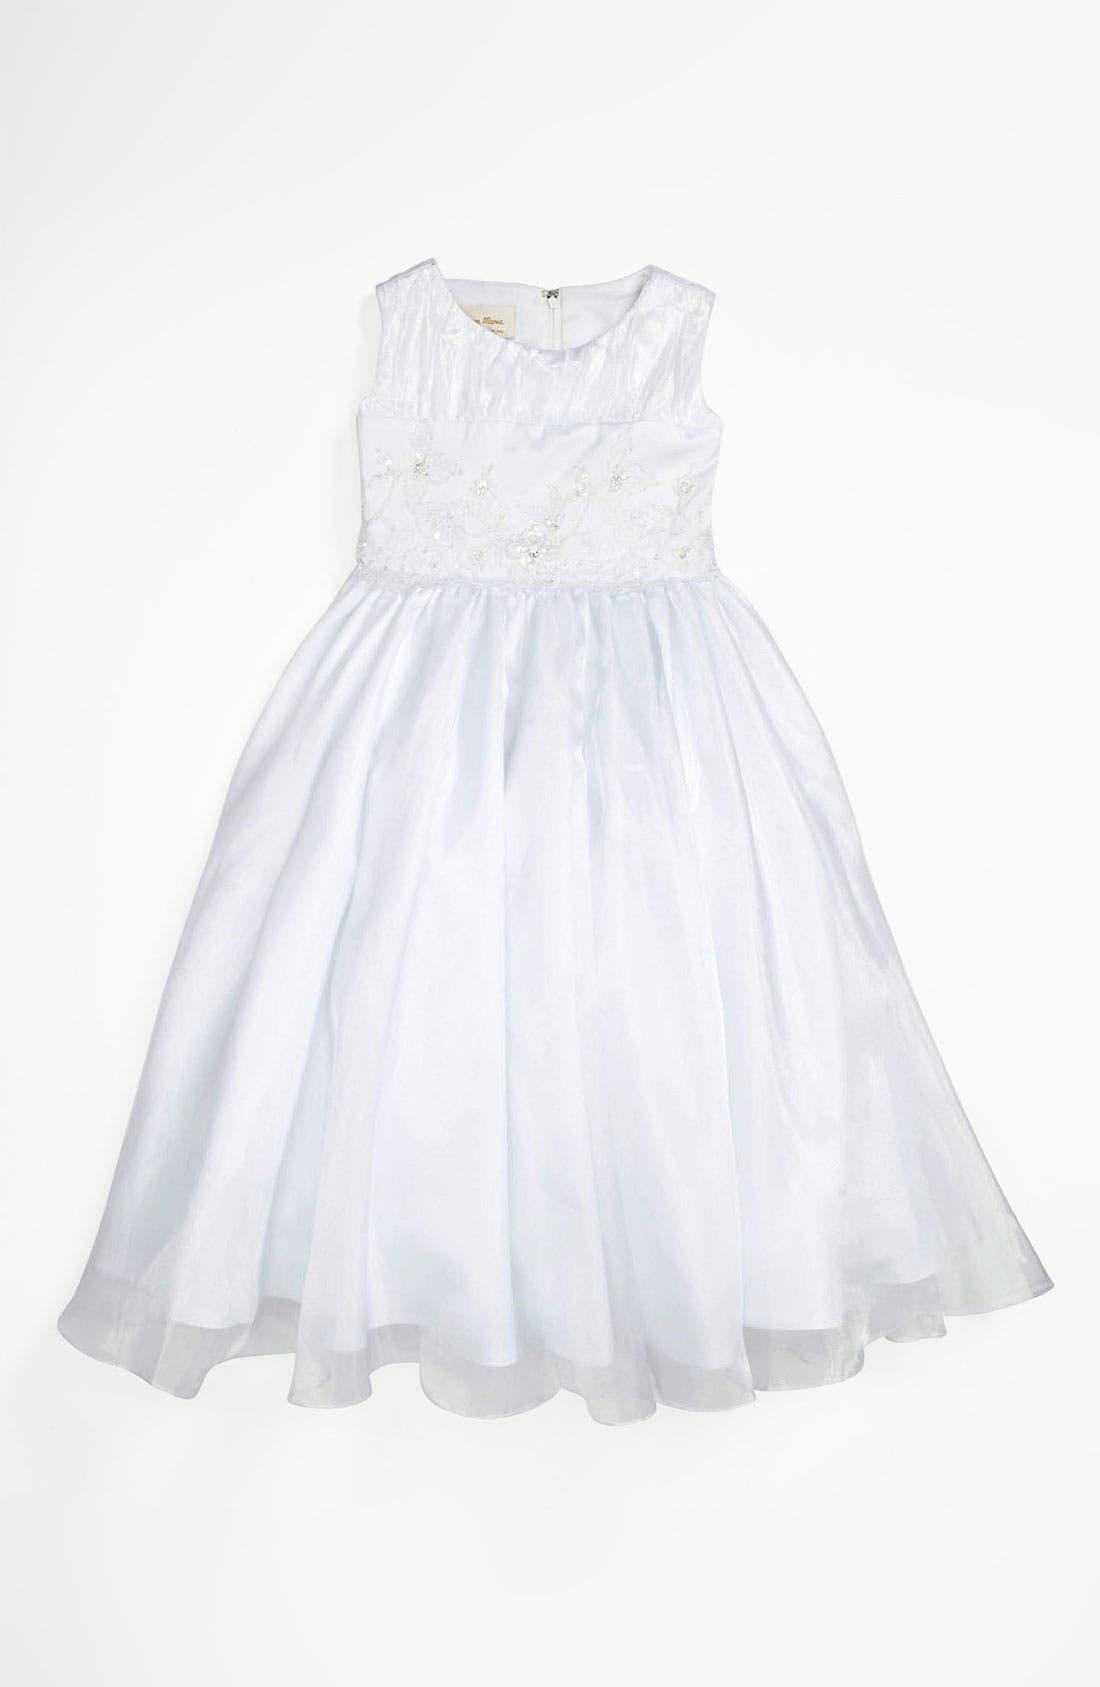 Main Image - Lauren Marie Embroidered Dress (Little Girls & Big Girls)